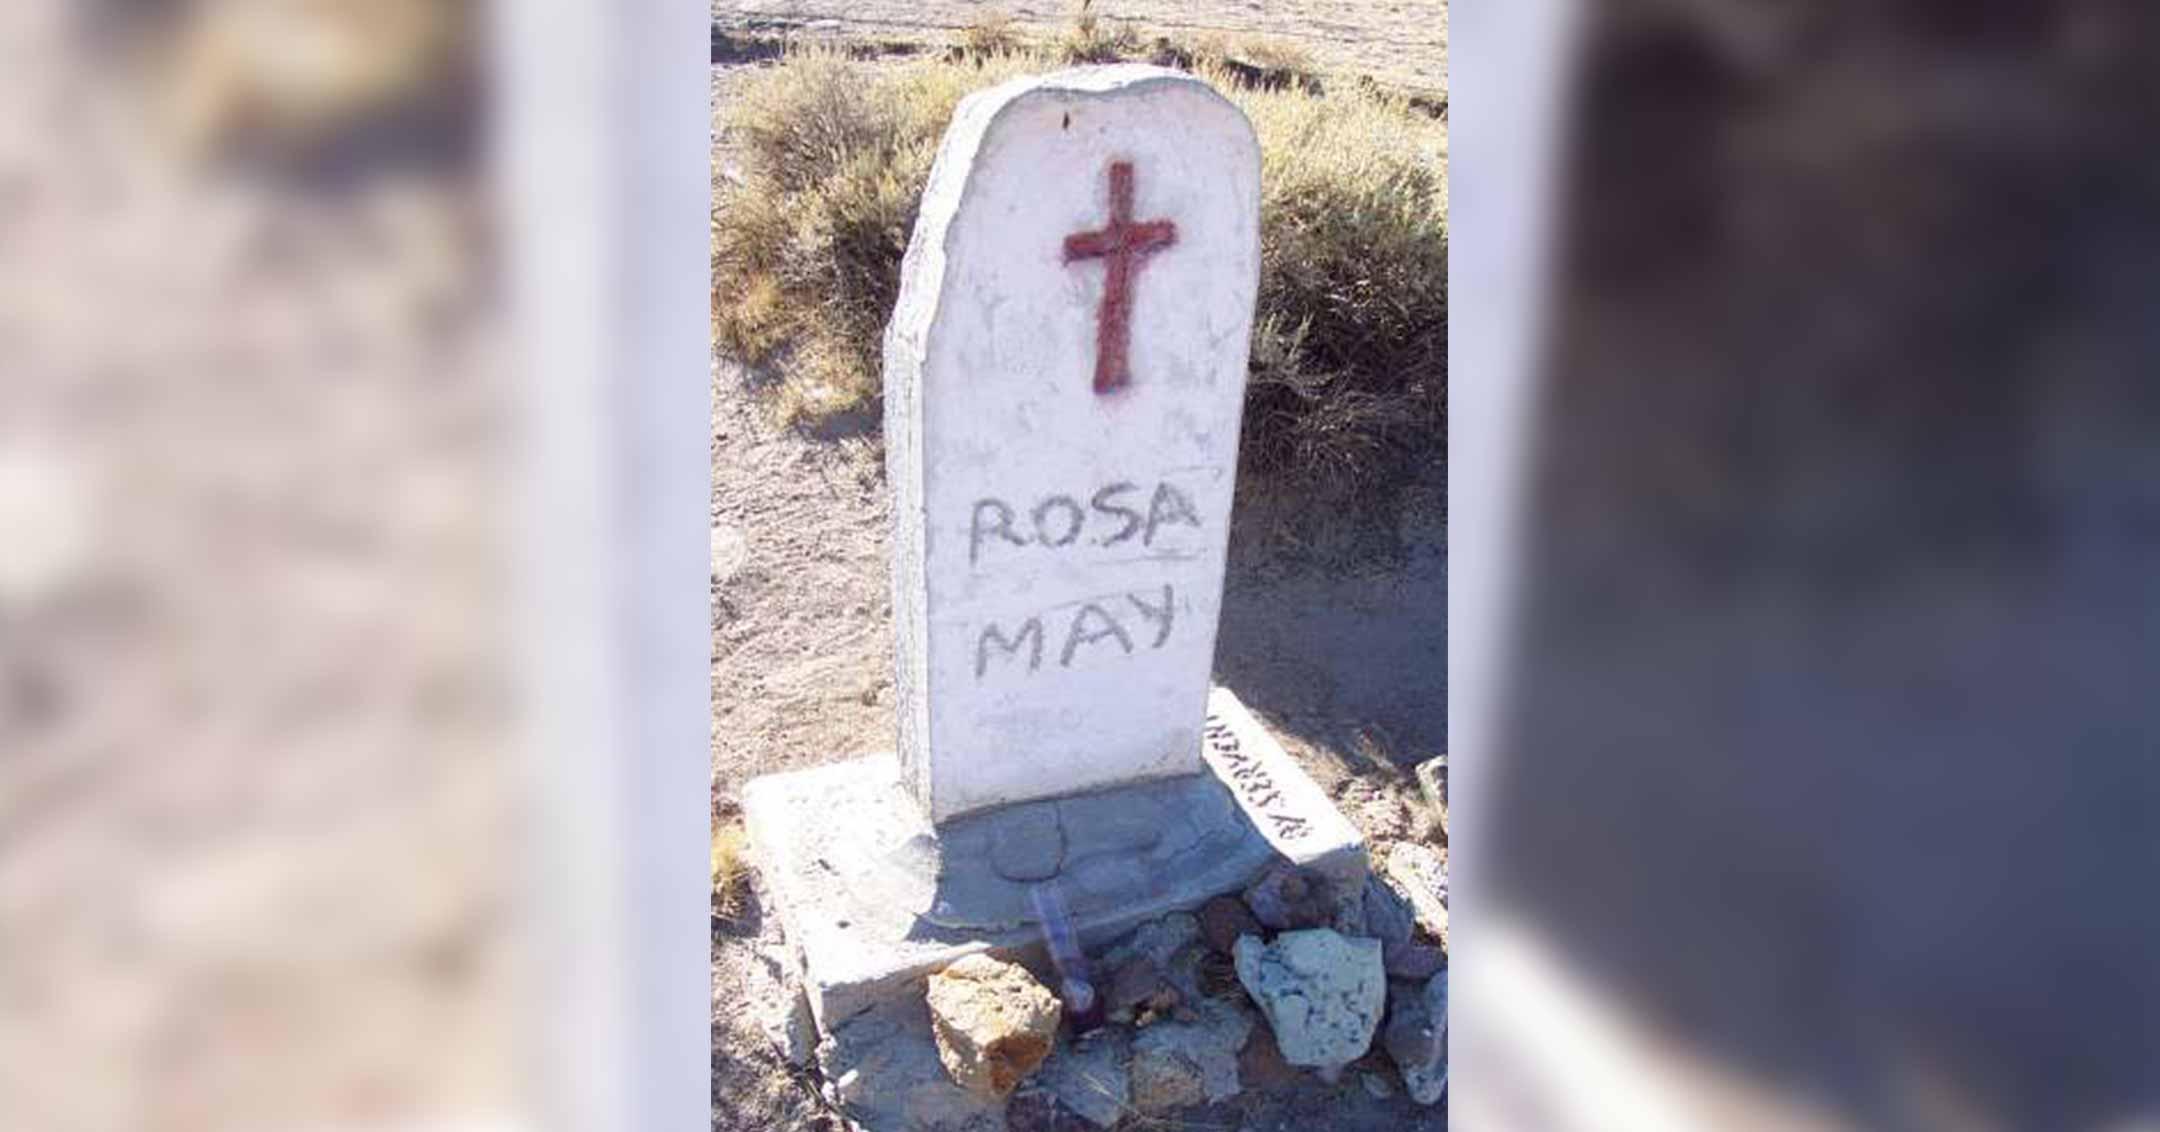 Rosa May Oalaque | Bodie.com